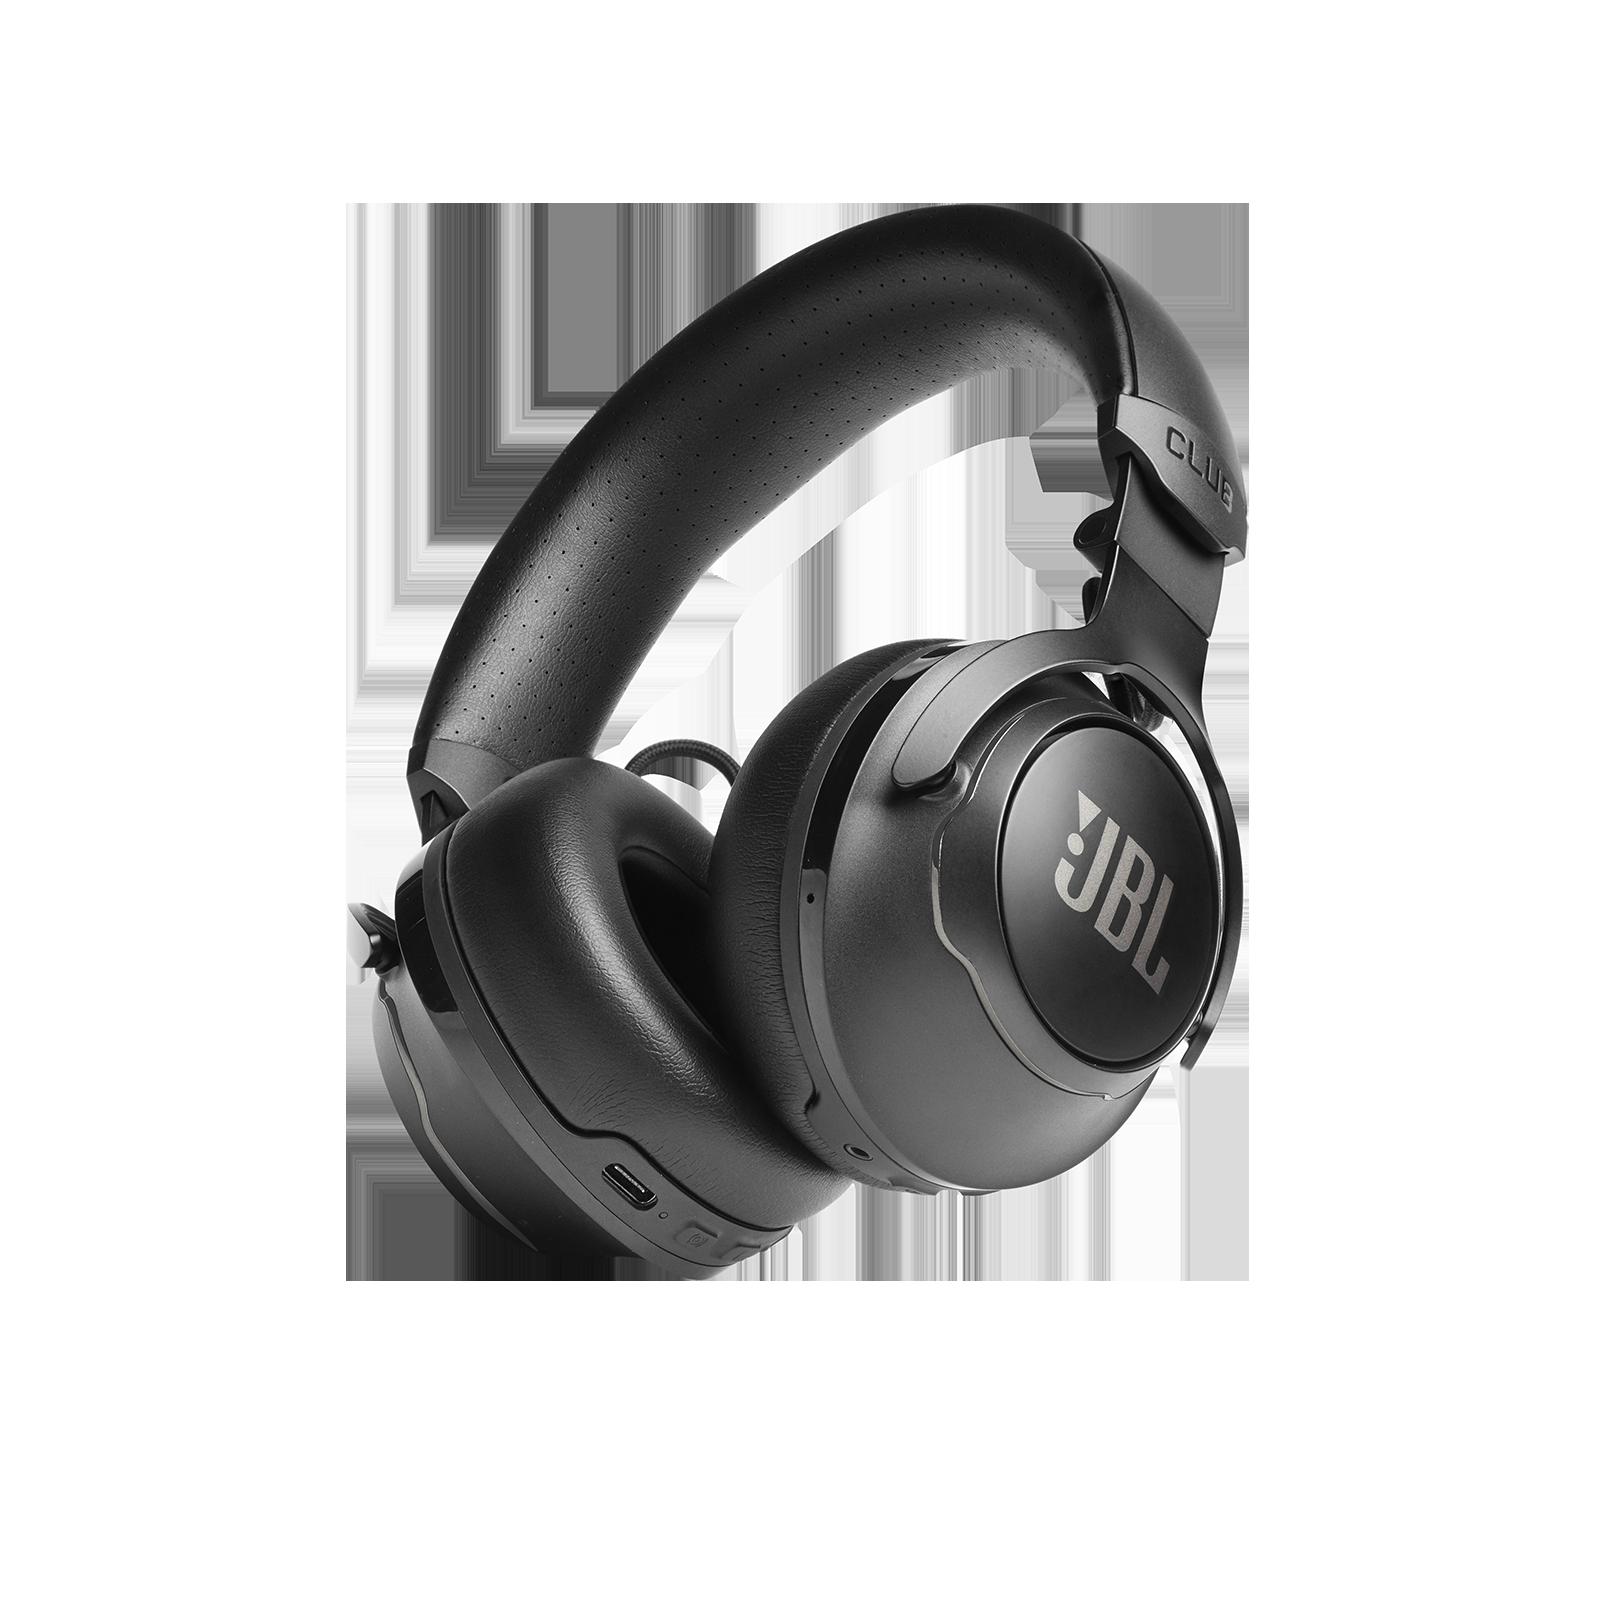 Jbl Club 700bt Wireless On Ear Headphones